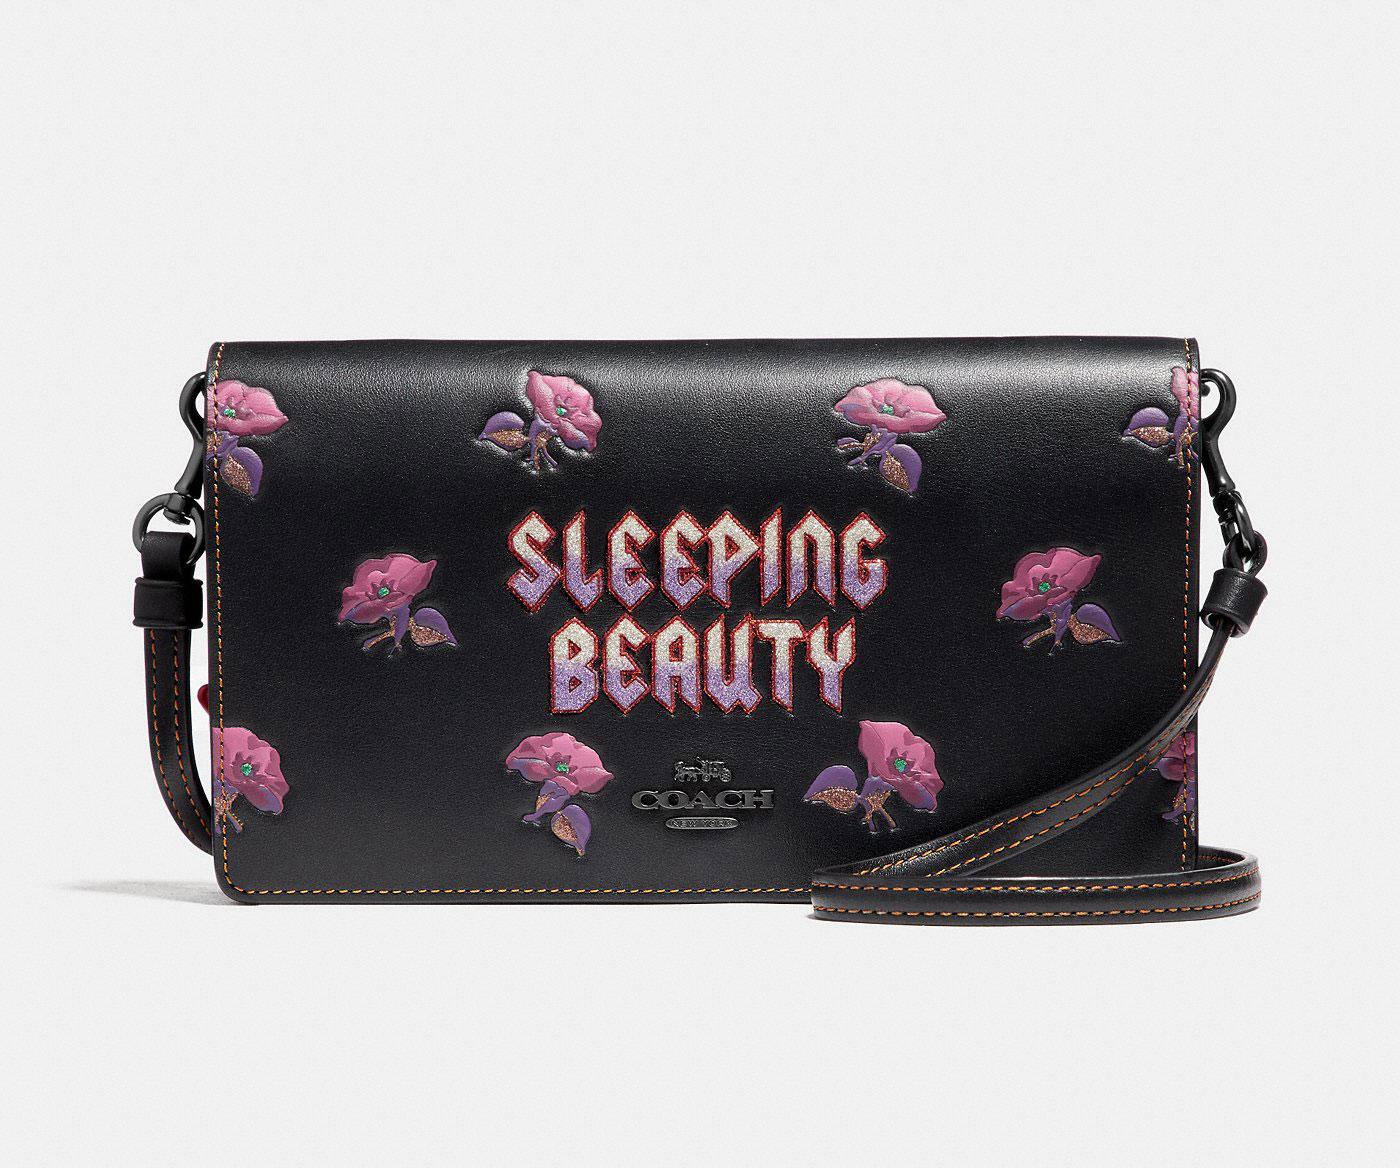 Coach x Disney Sleeping Beauty foldover clutch - Black Coach SG1Rv55whE